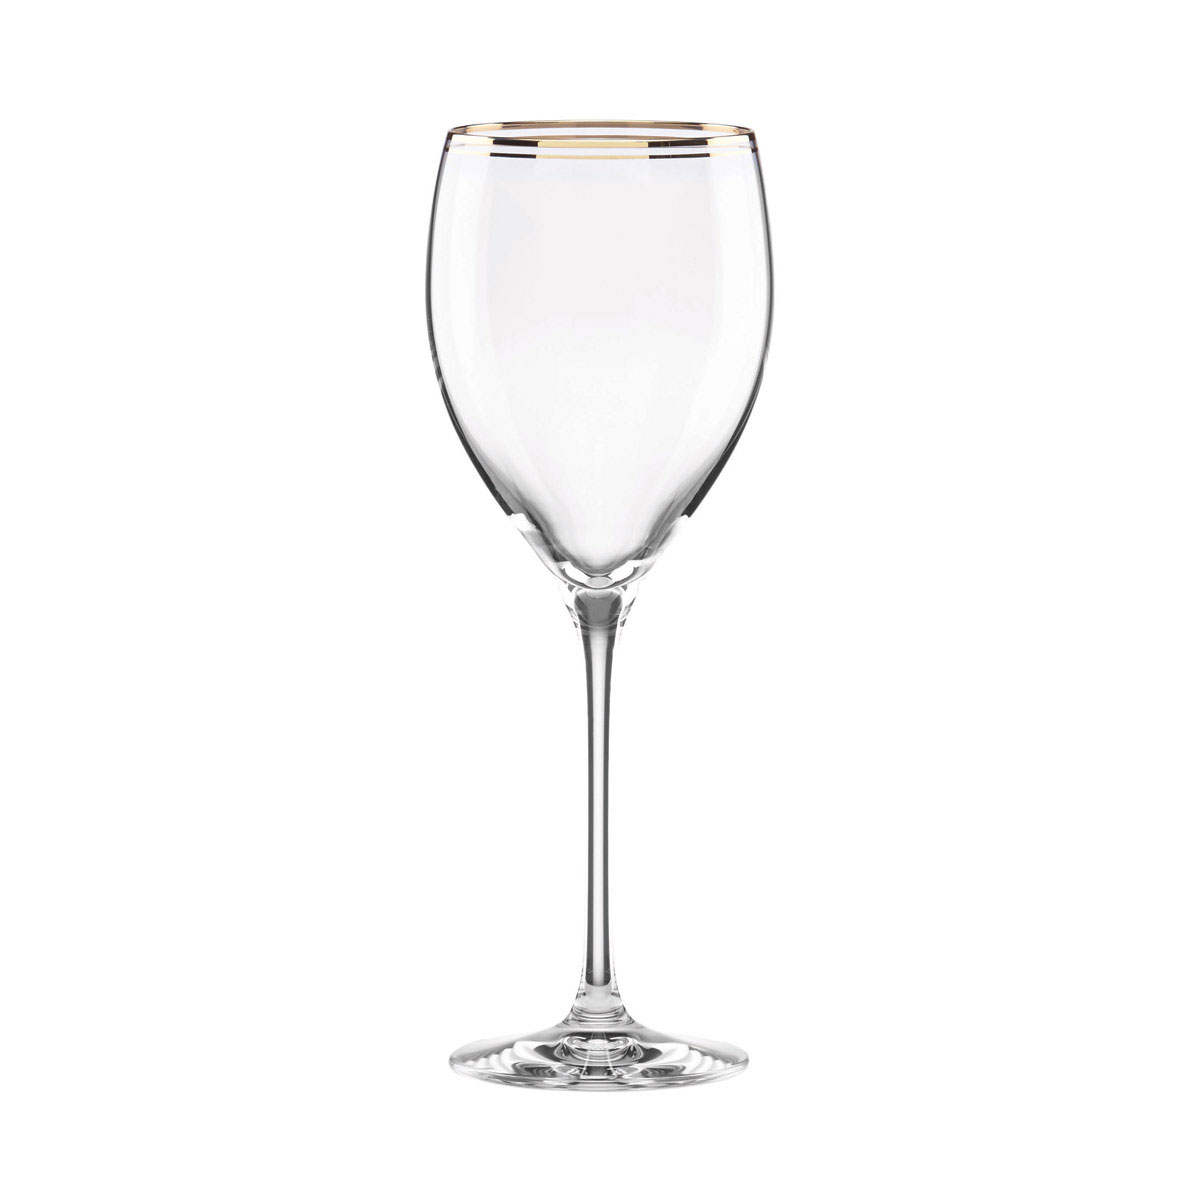 Kate Spade New York, Lenox Orleans Square Gold Crystal Goblet, Single